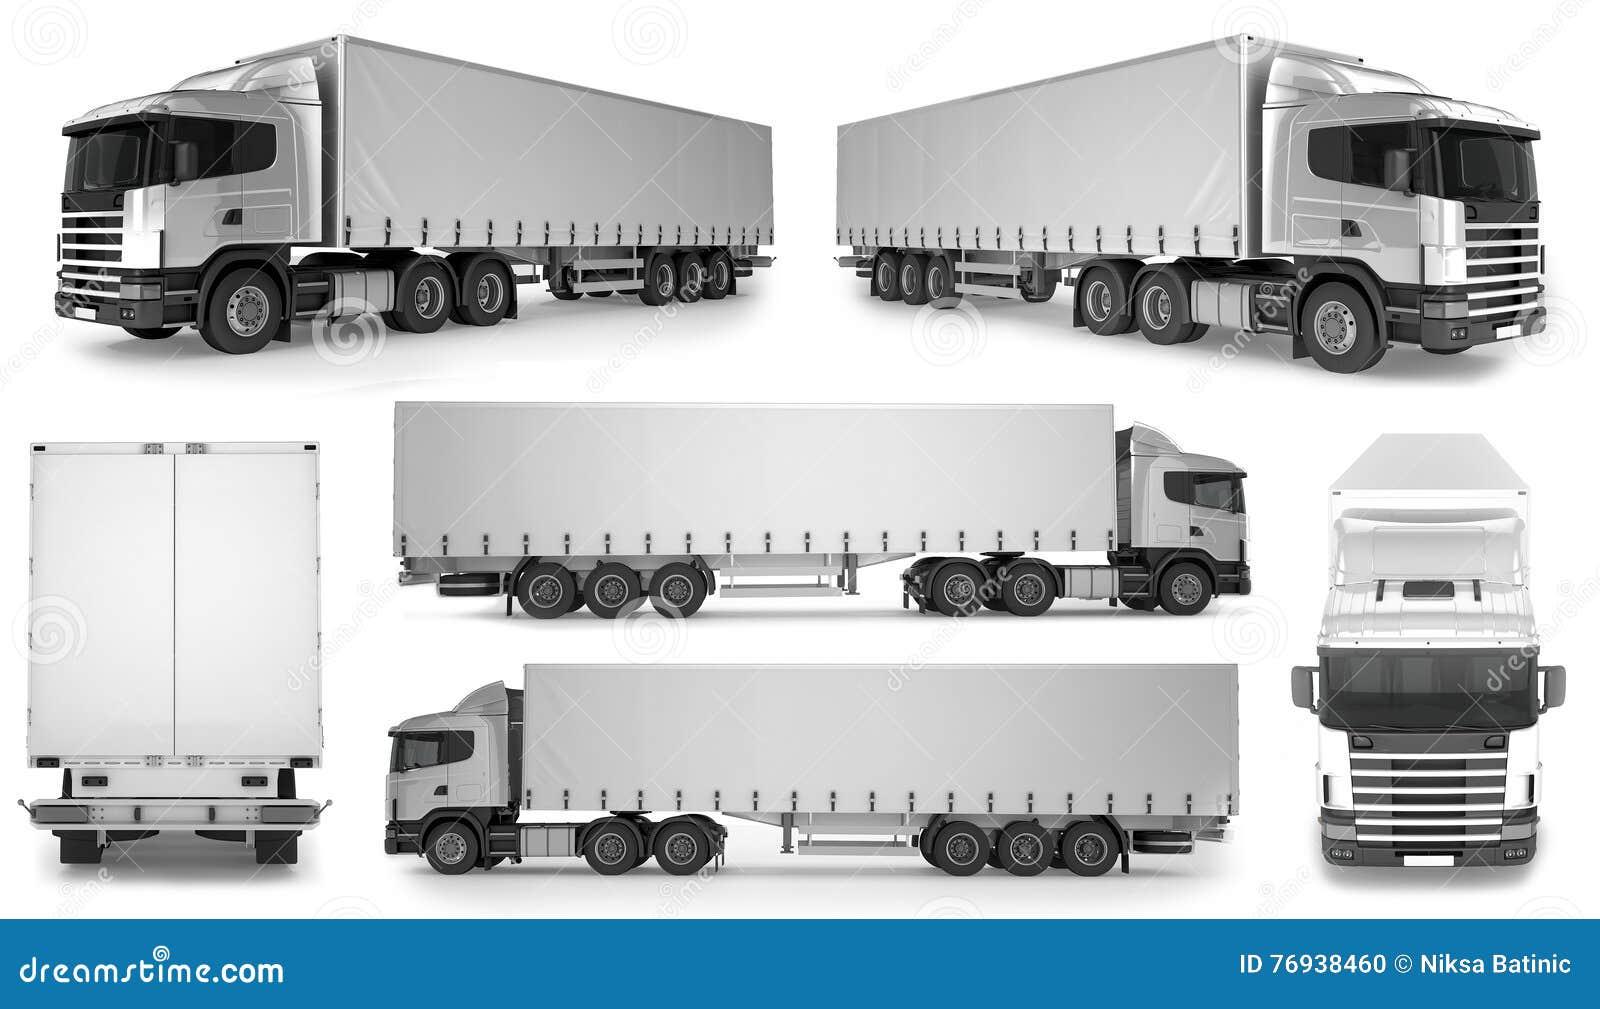 Image Of Car Trailer Plans Free Download Flatbed Tilt Wiring Diagrams For Trailers Hauler 1972 F250 Diagram Data U2022